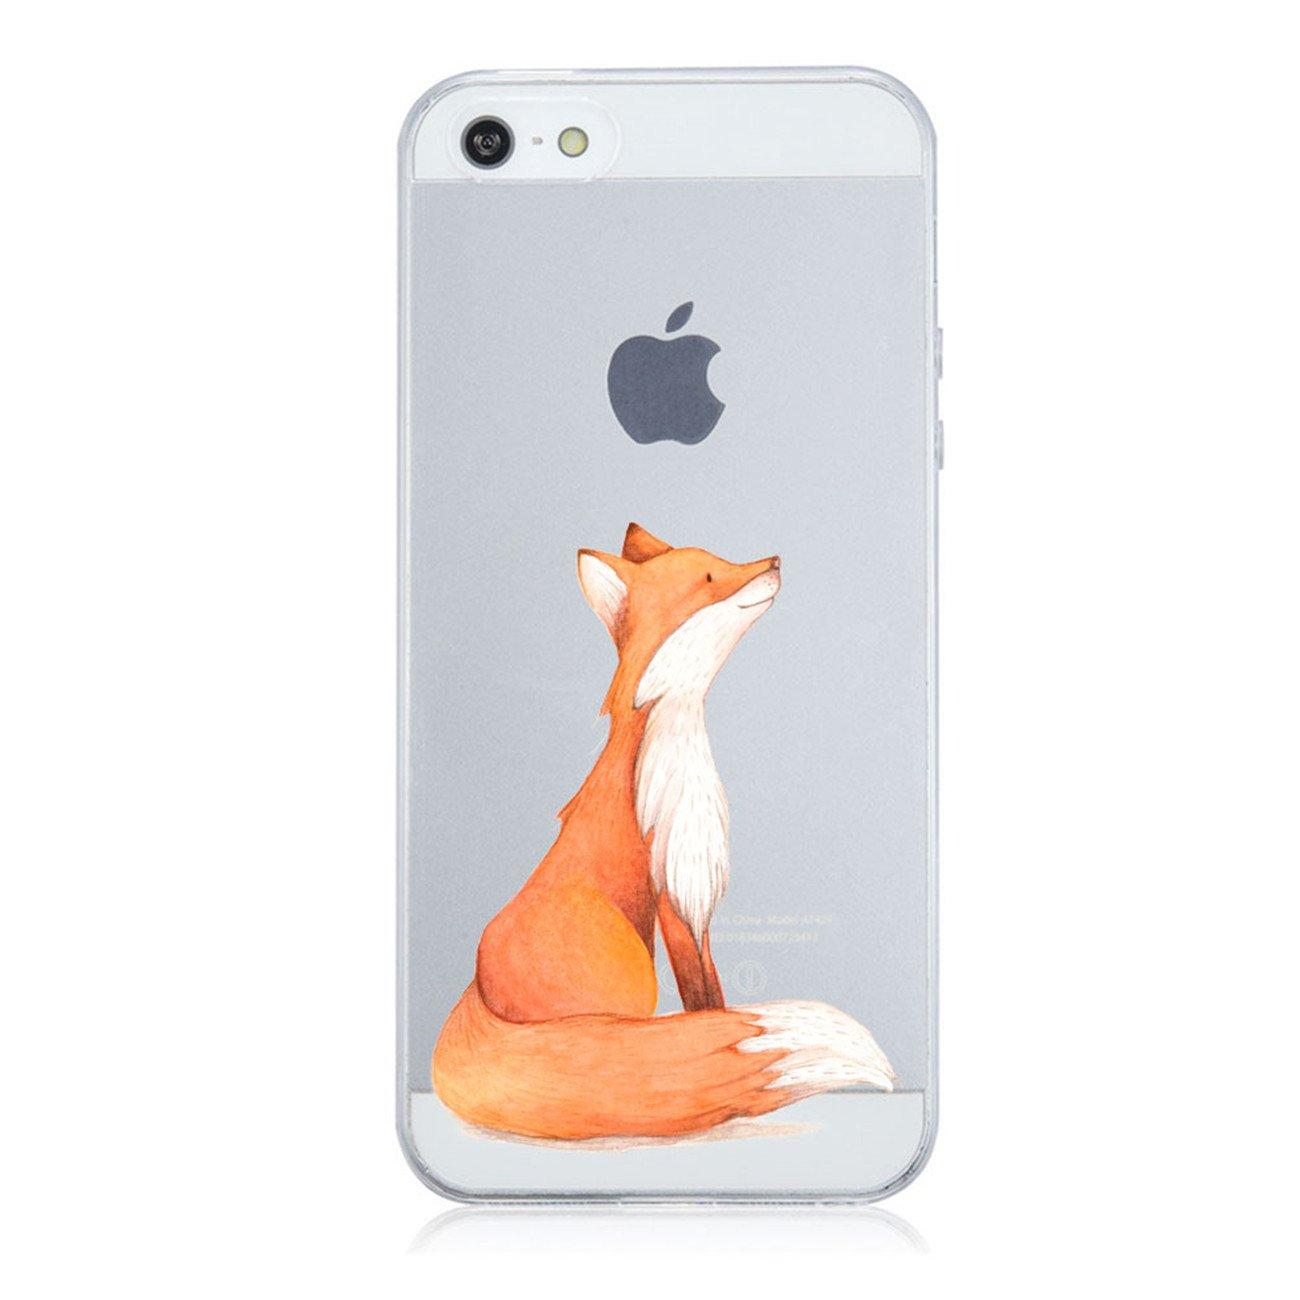 Caler Cover iPhone Custodia iPhone SE 5S 5 Caso Silicone TPU Ultra